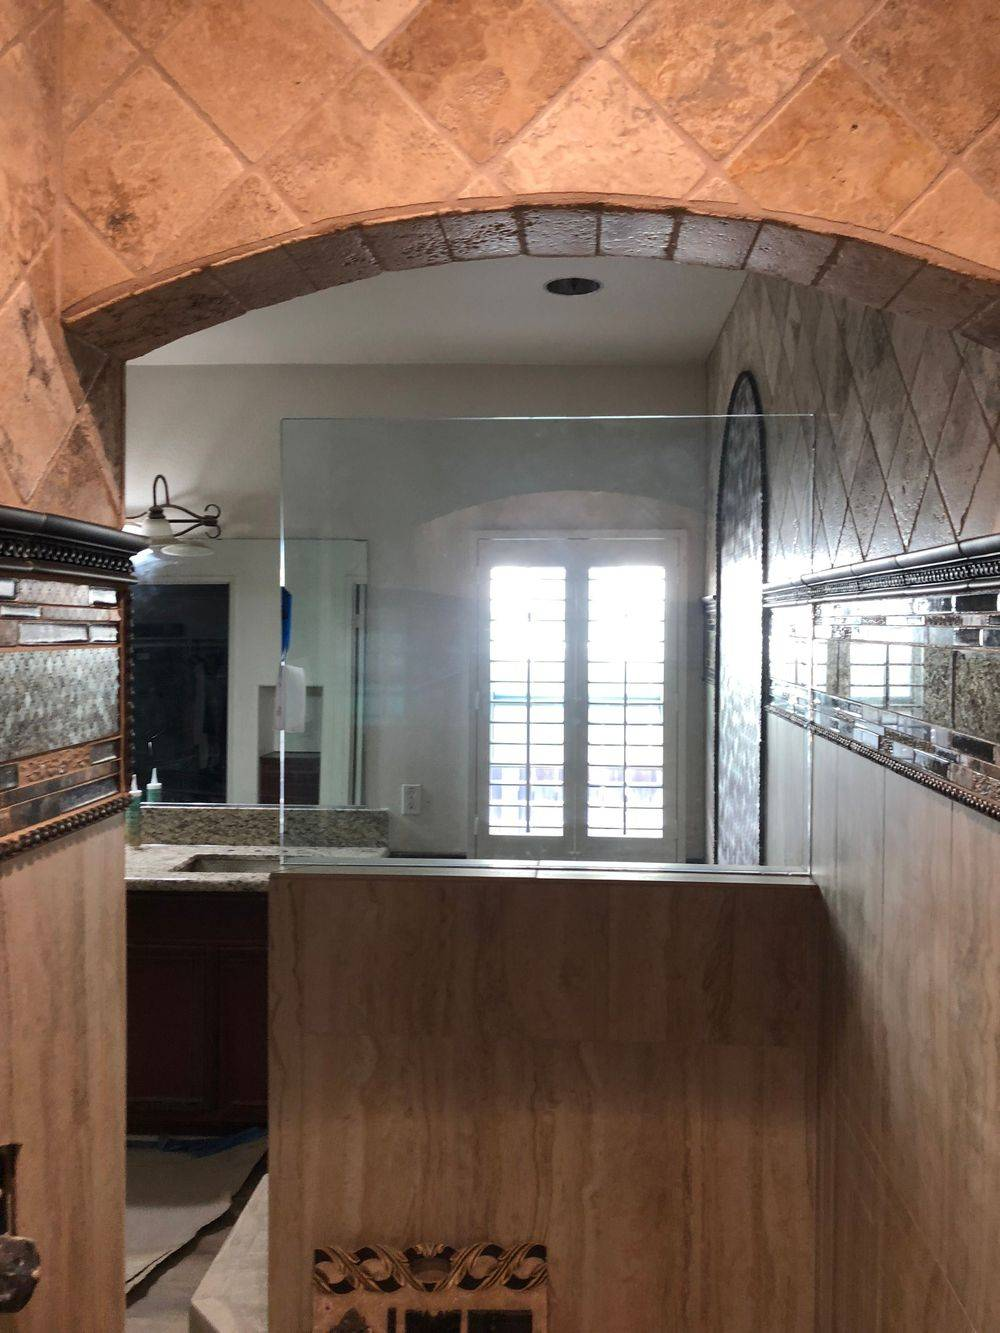 bathroom remodelers, bath remodel, romantic bathroom remodel, bathroom remodel tile